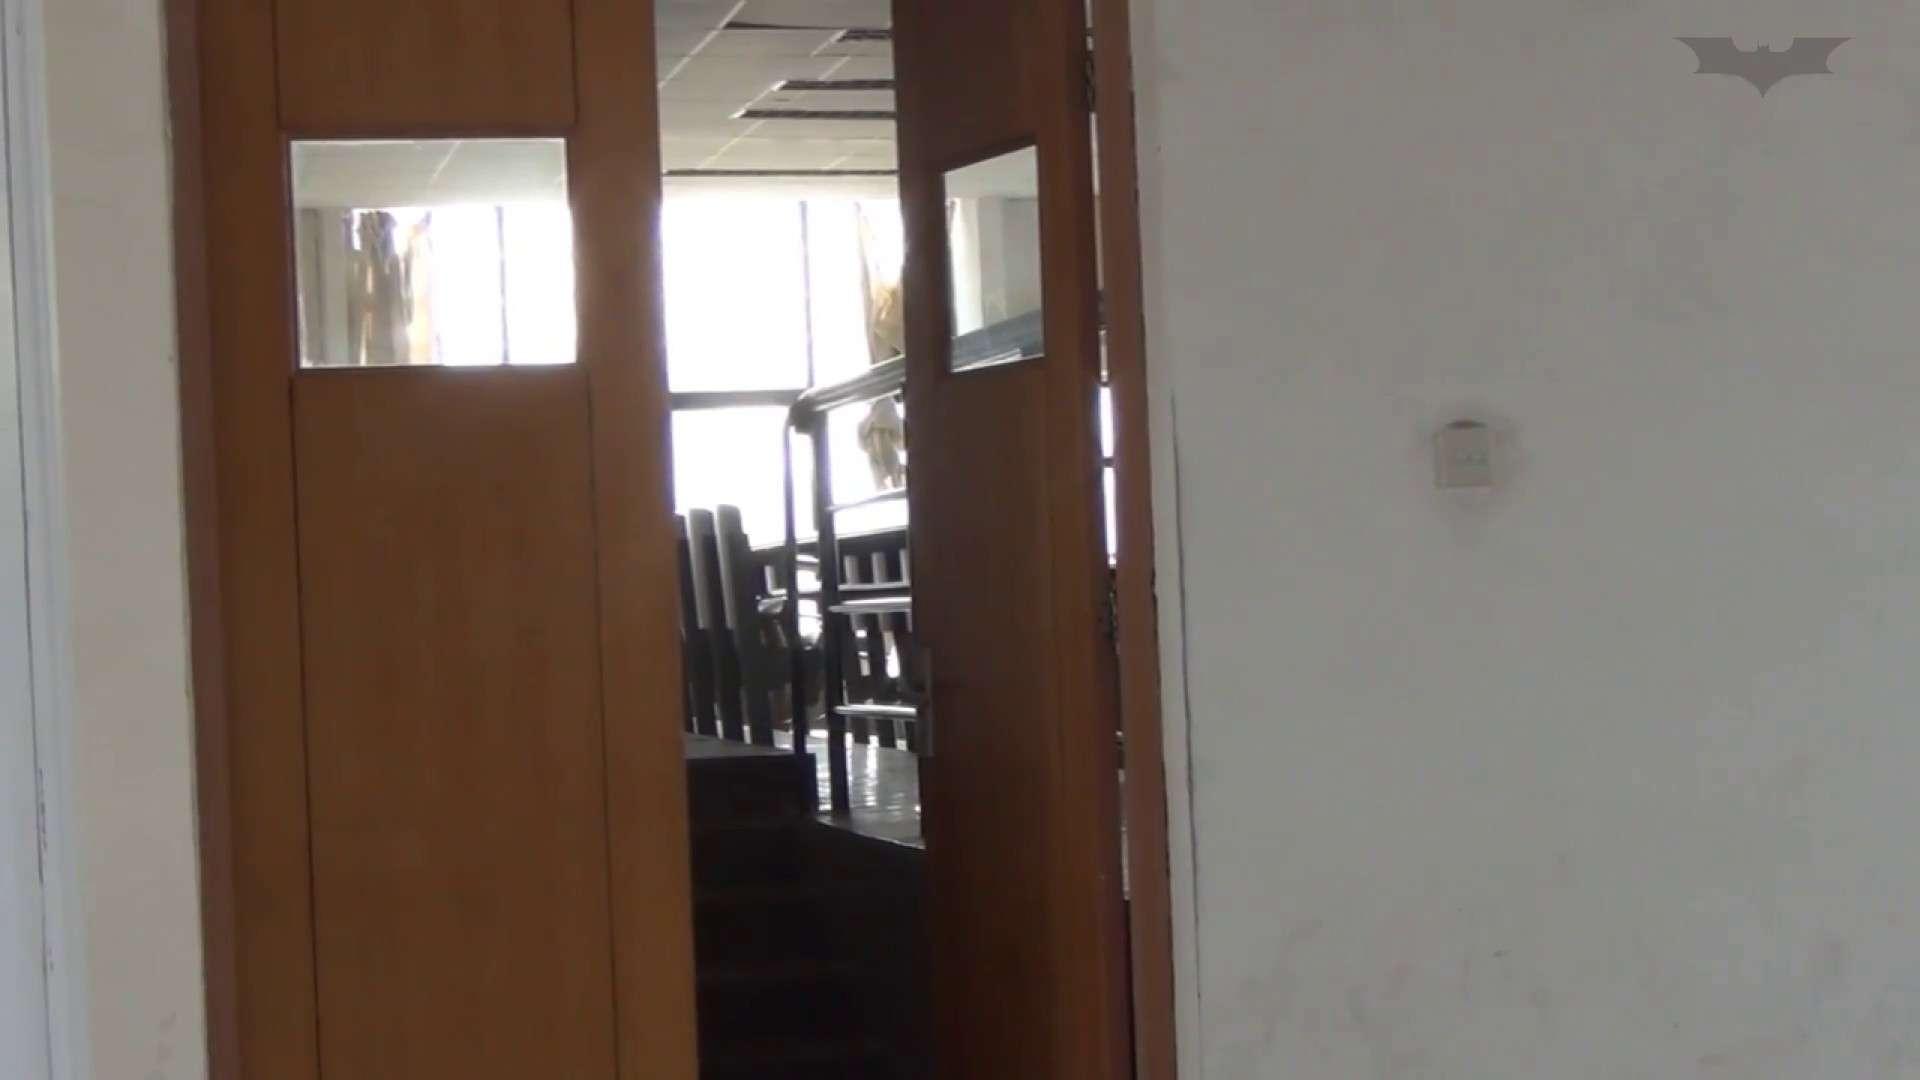 JD盗撮 美女の洗面所の秘密 Vol.61 洗面所 アダルト動画キャプチャ 108画像 86